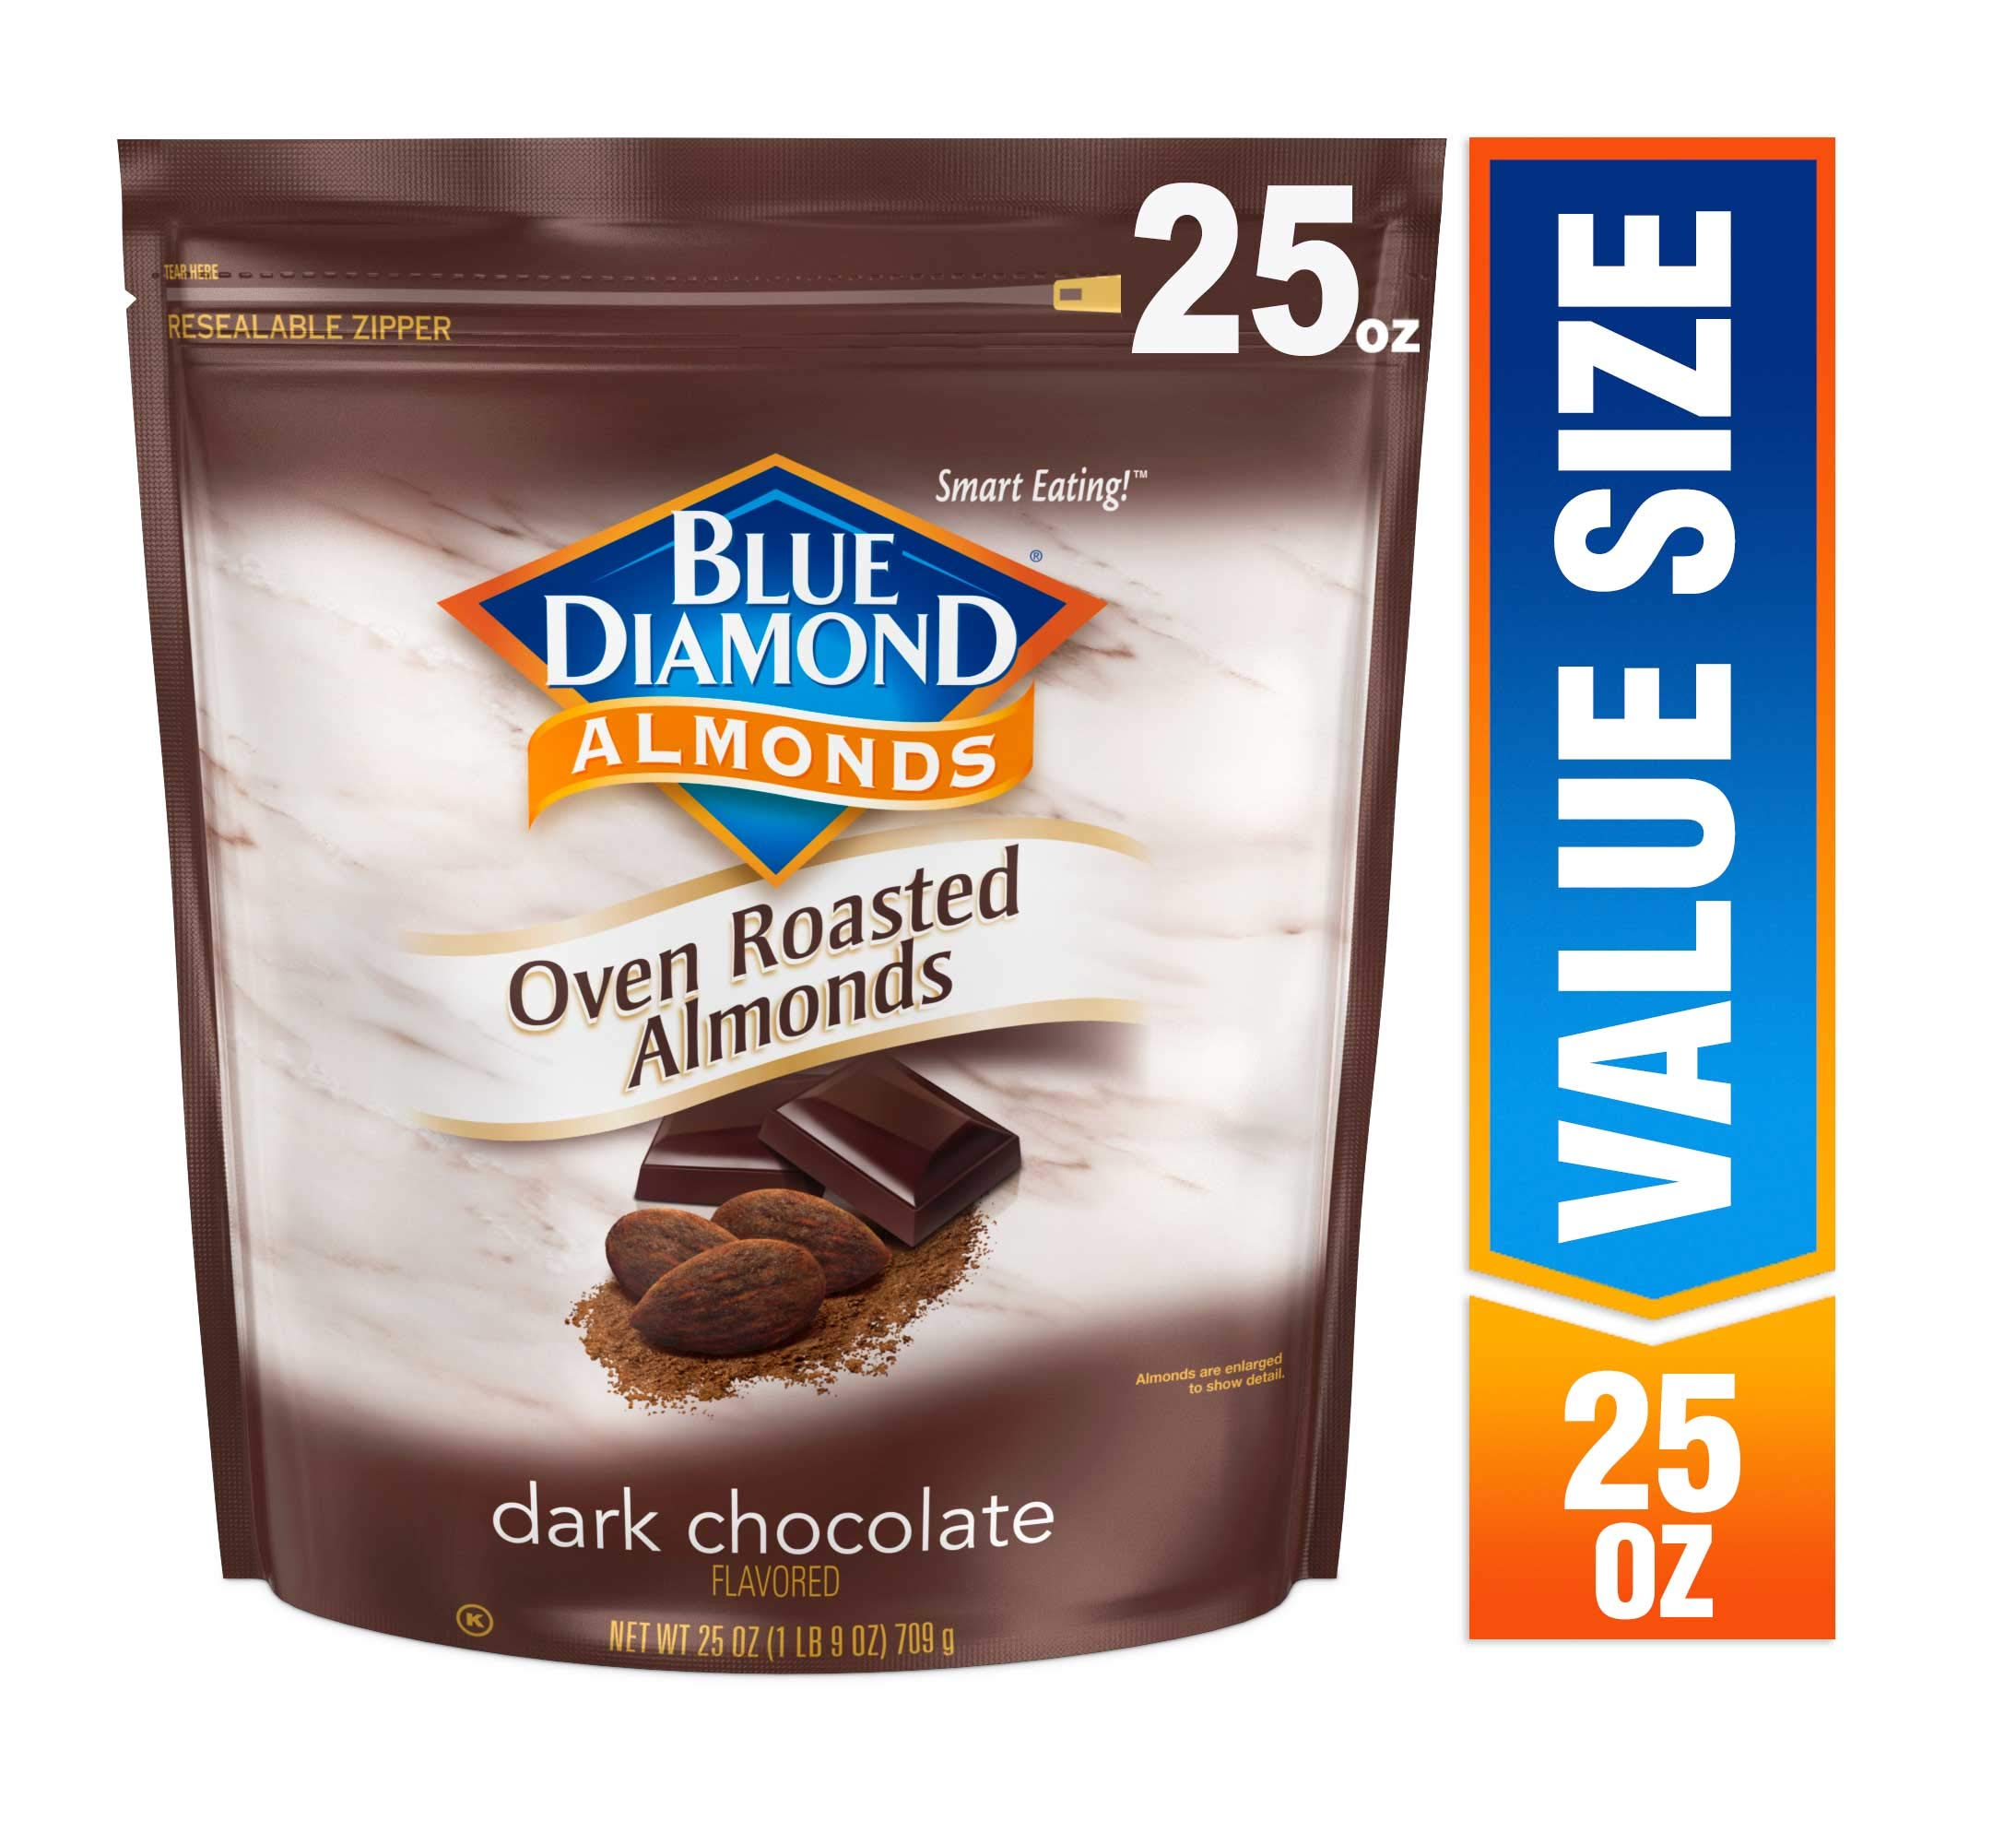 Blue Diamond Almonds, Oven Roasted  Almonds, 25 Ounce by Blue Diamond Almonds